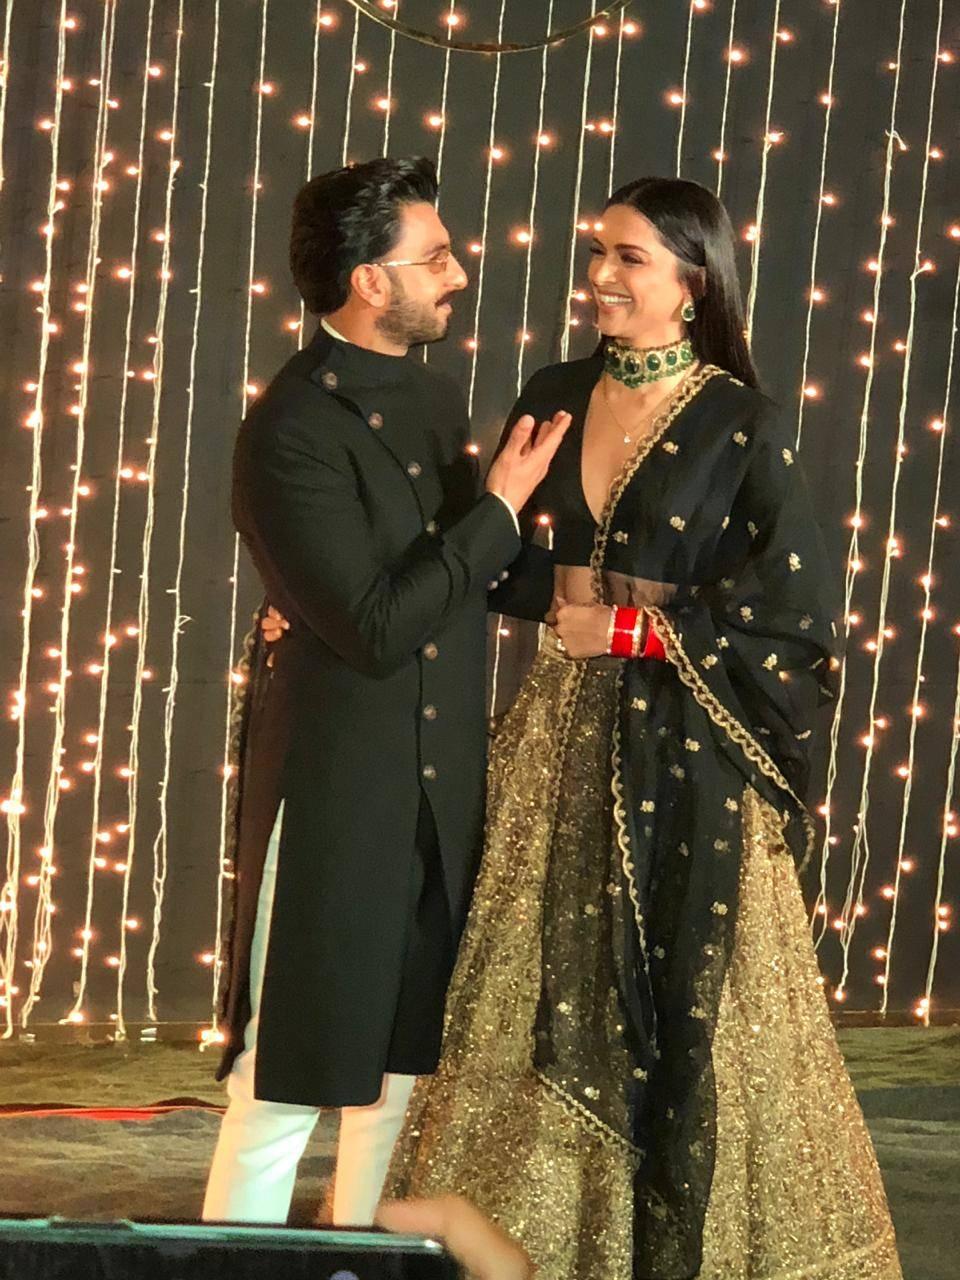 Ranveer Singh And Deepika Padukone Twin In Black As The Attend Priyanka Chopra Nick Jonas Bollywood Reception Hindi Movie News Times Of India